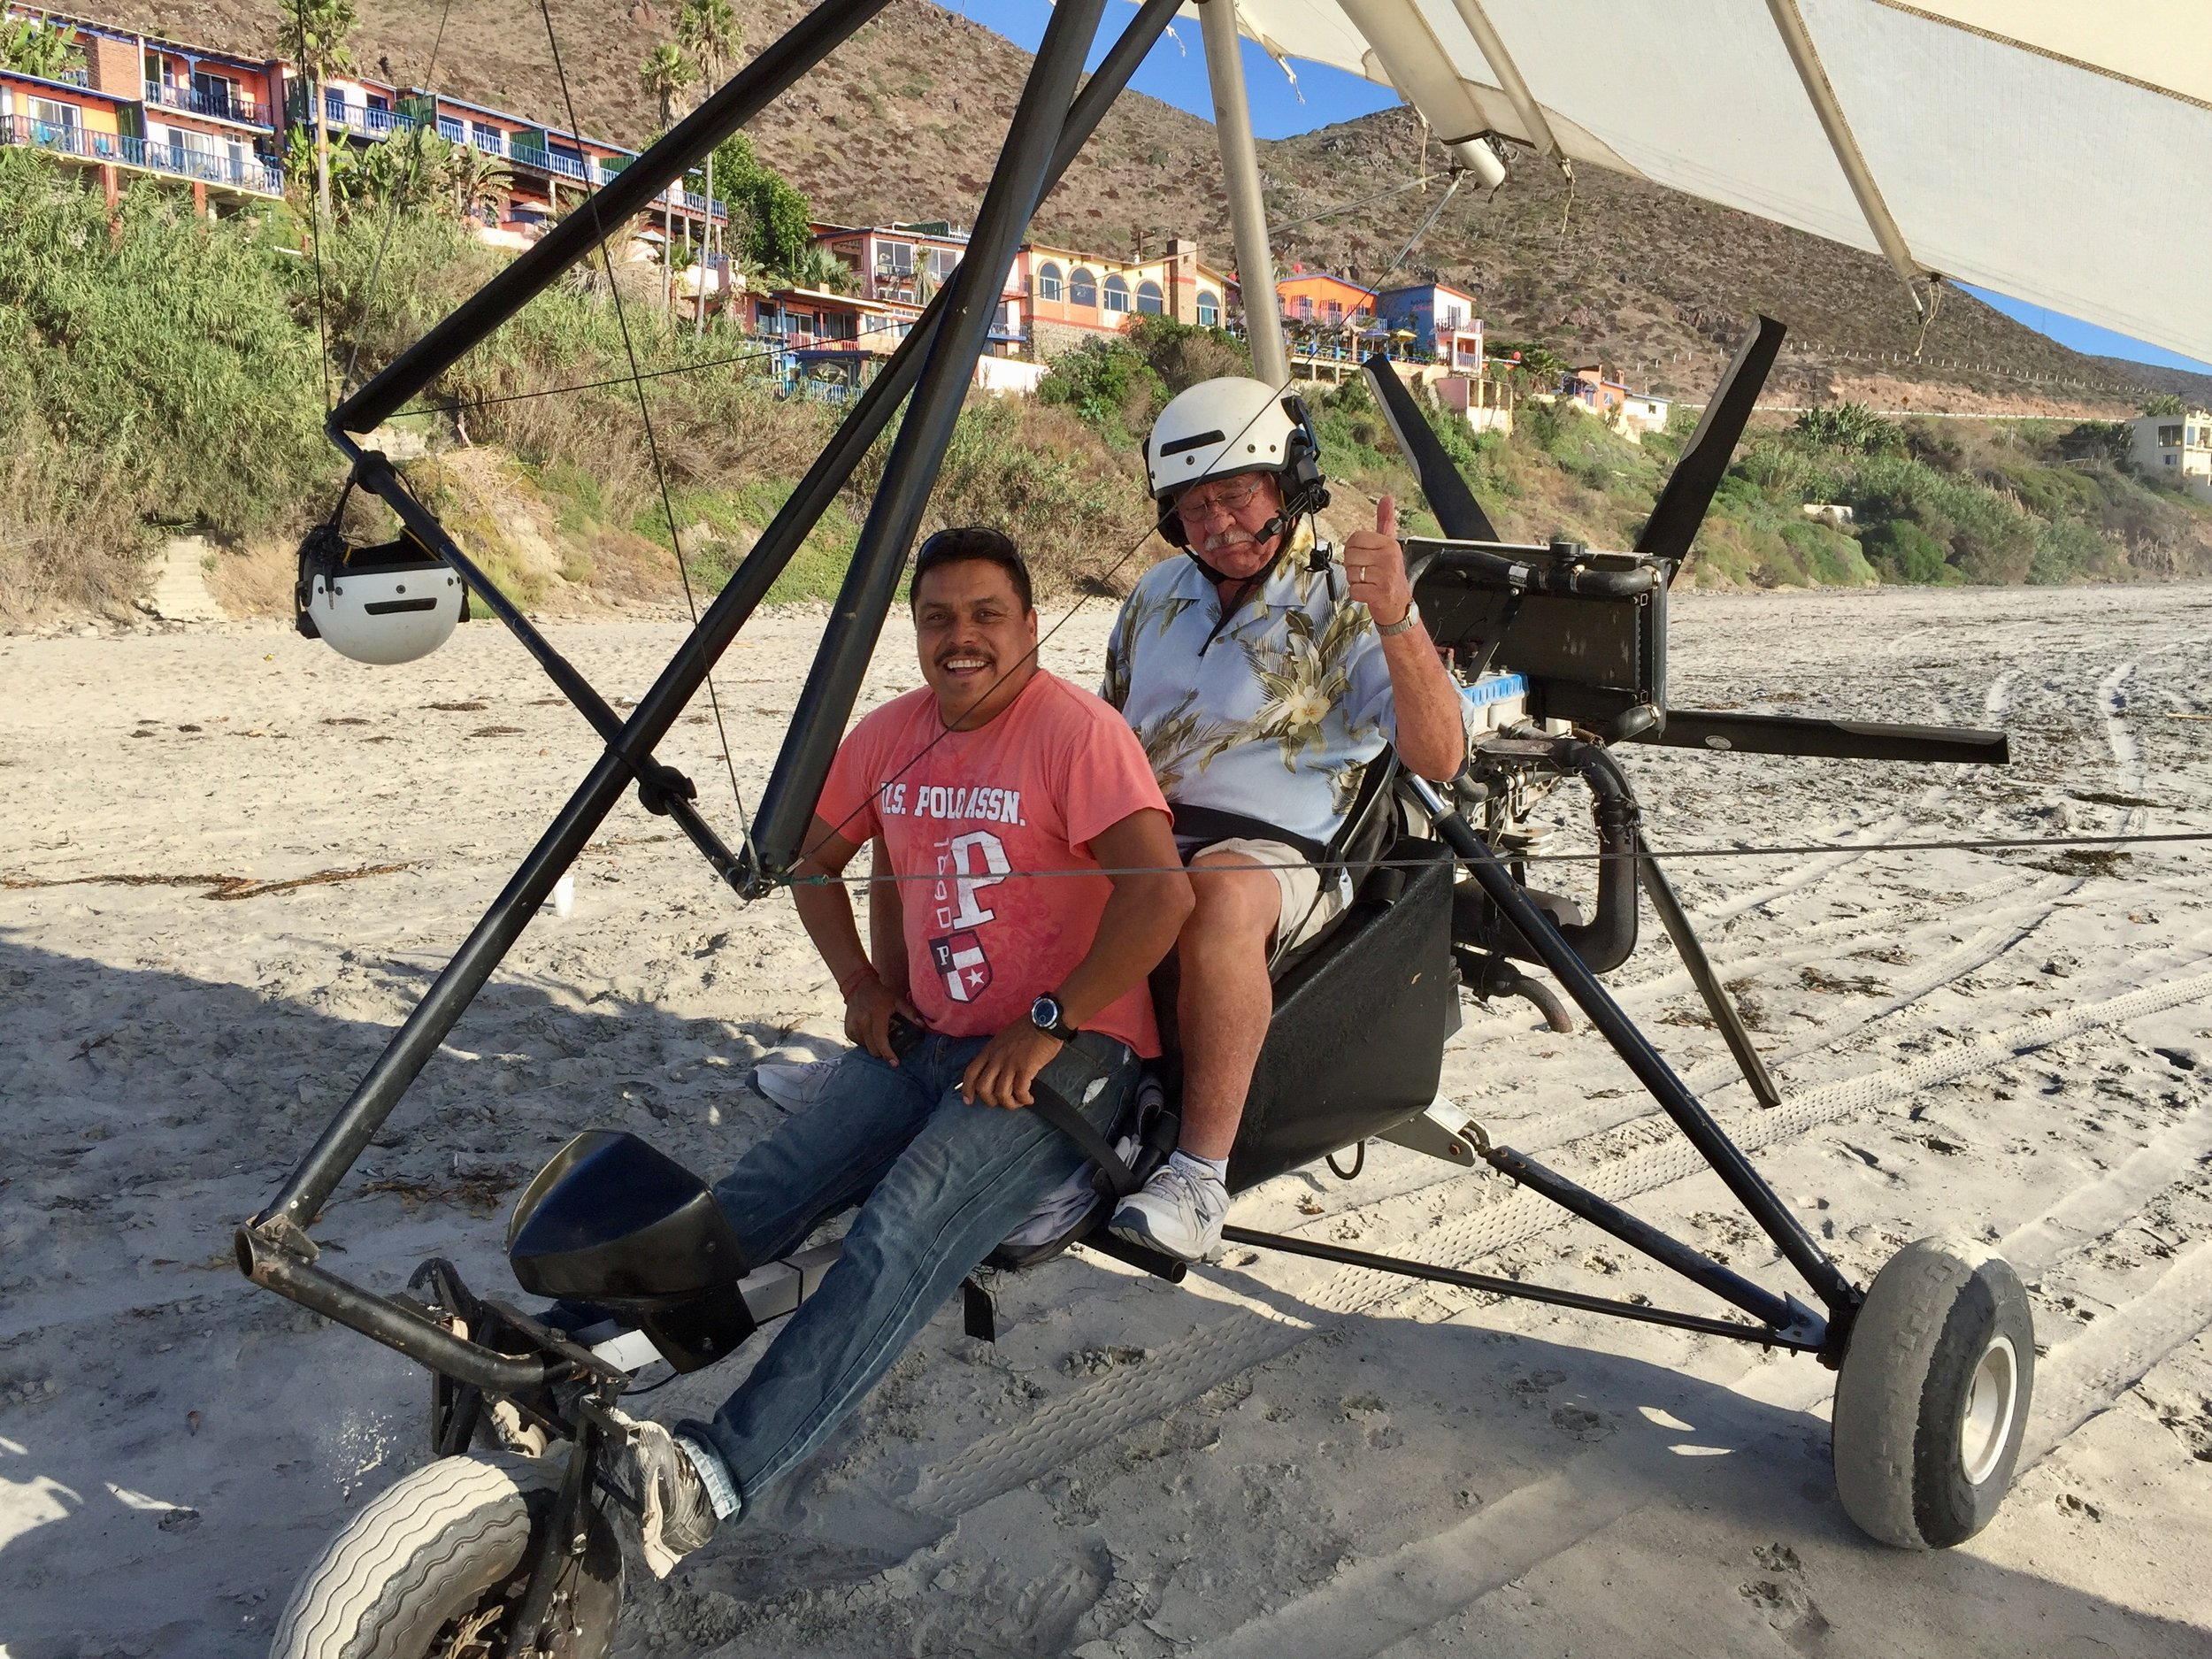 Buckle up for an ultralight flight over the beach at La Fonda